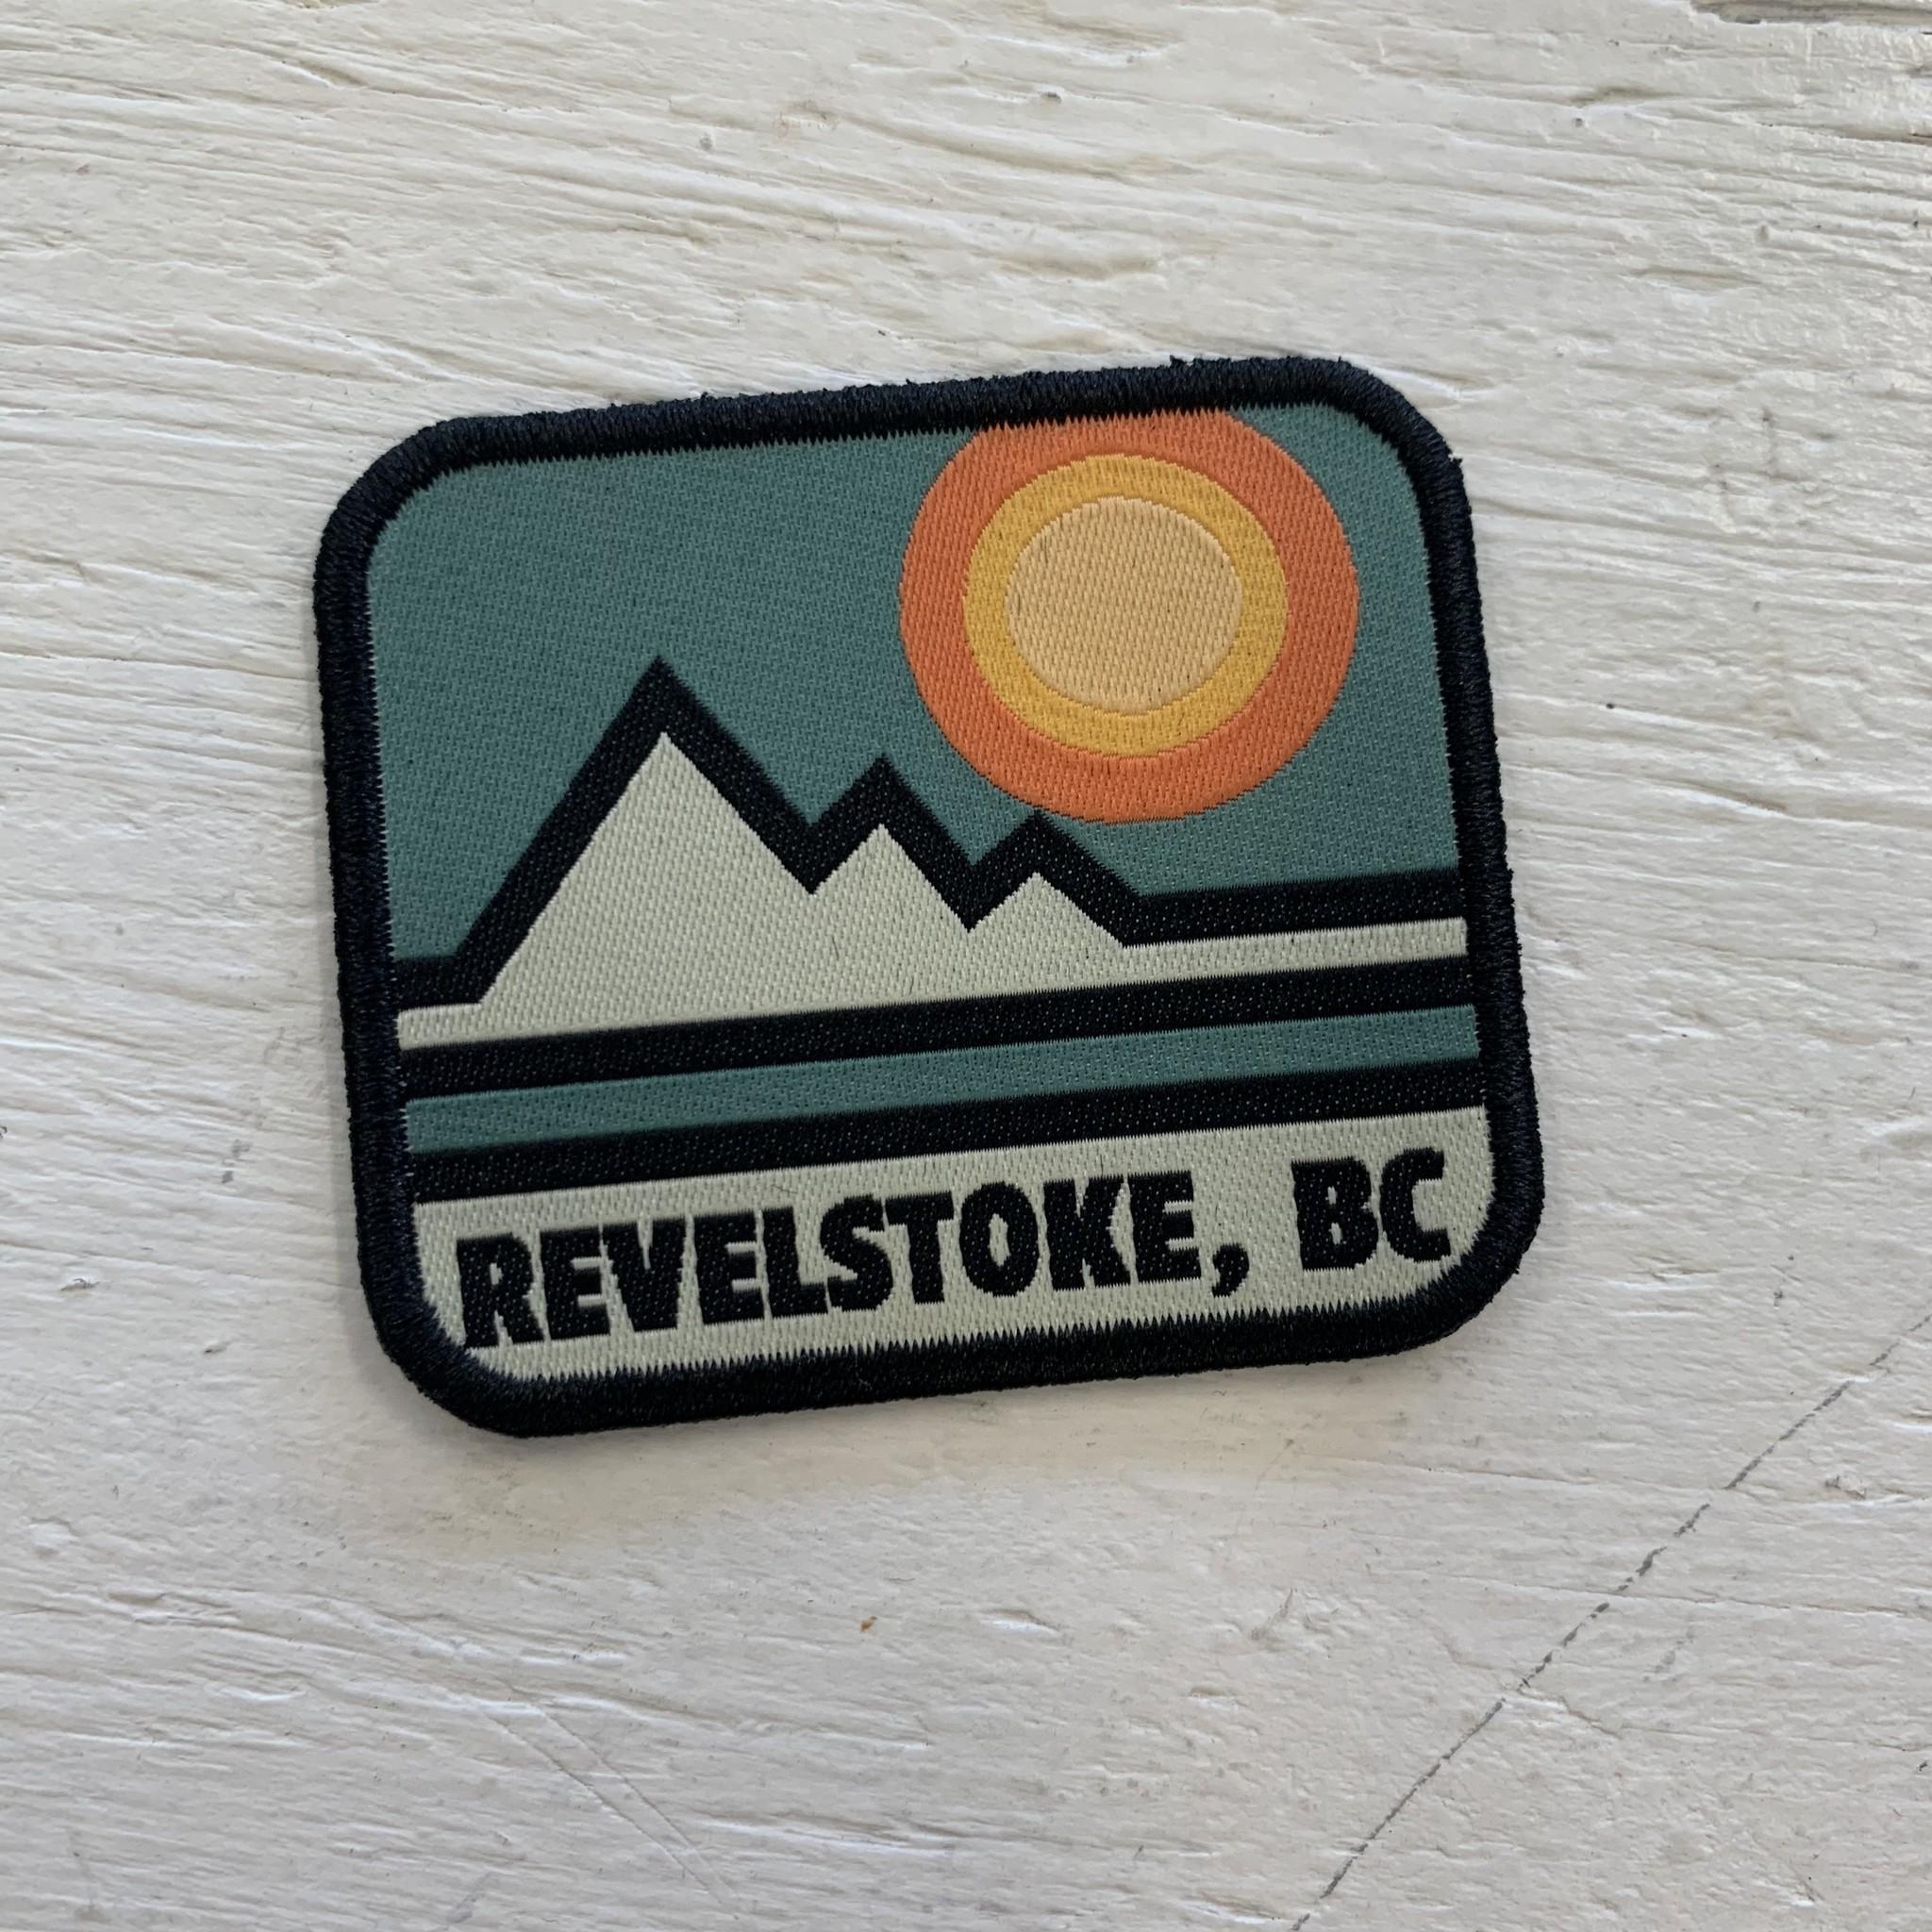 Revelstoke Trading Post Revelstoke - Retro Patch